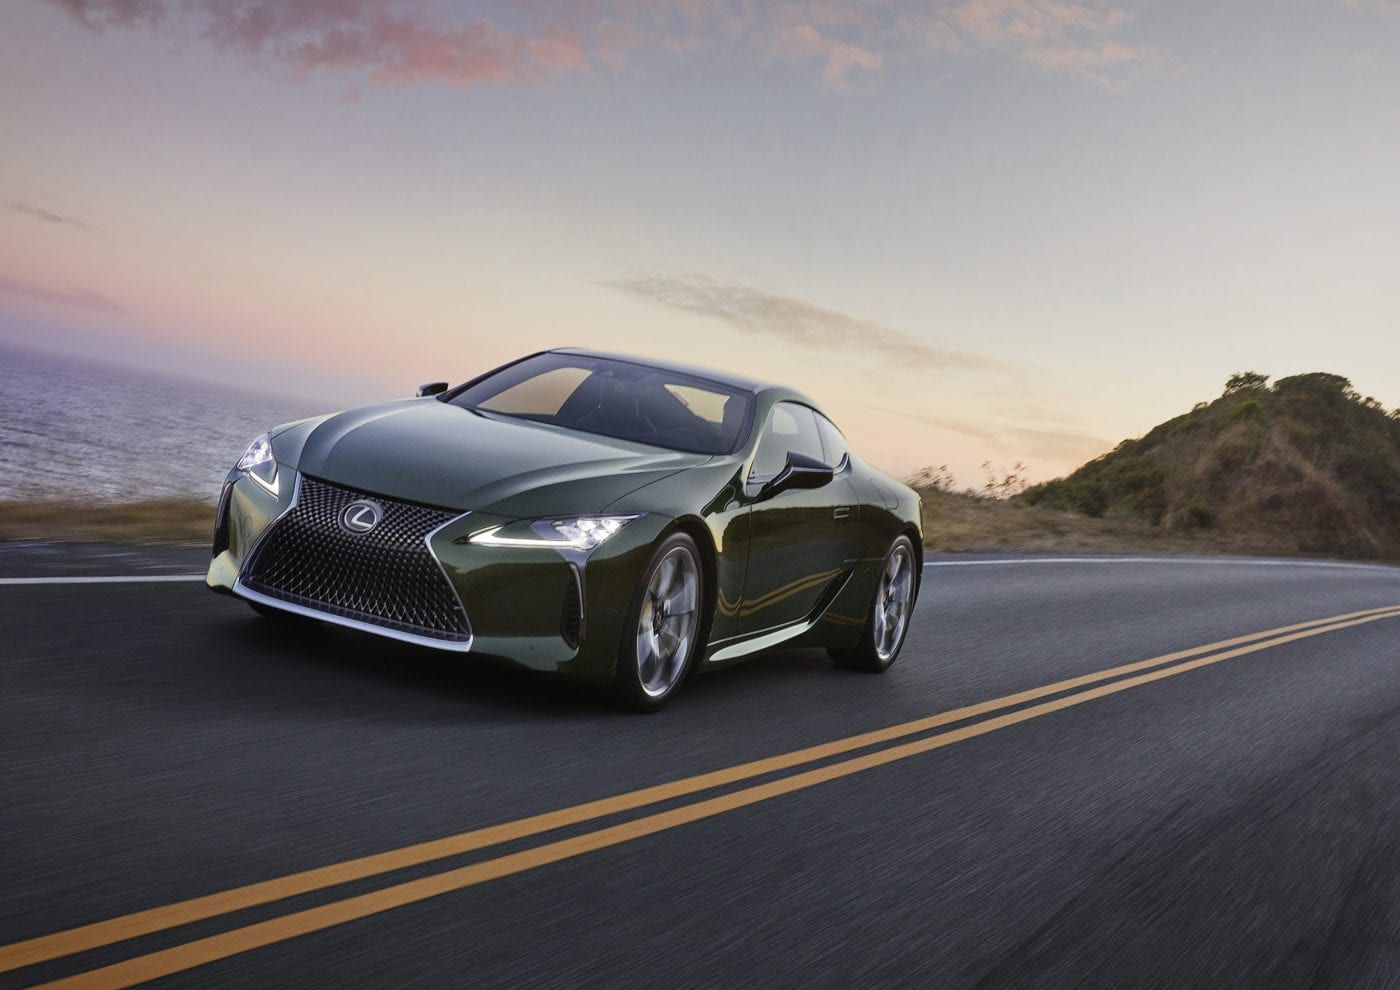 2020 Lexus Lc 500 Inspiration Series Is A Mean Green Machine Lexus Lc Lexus Coupe